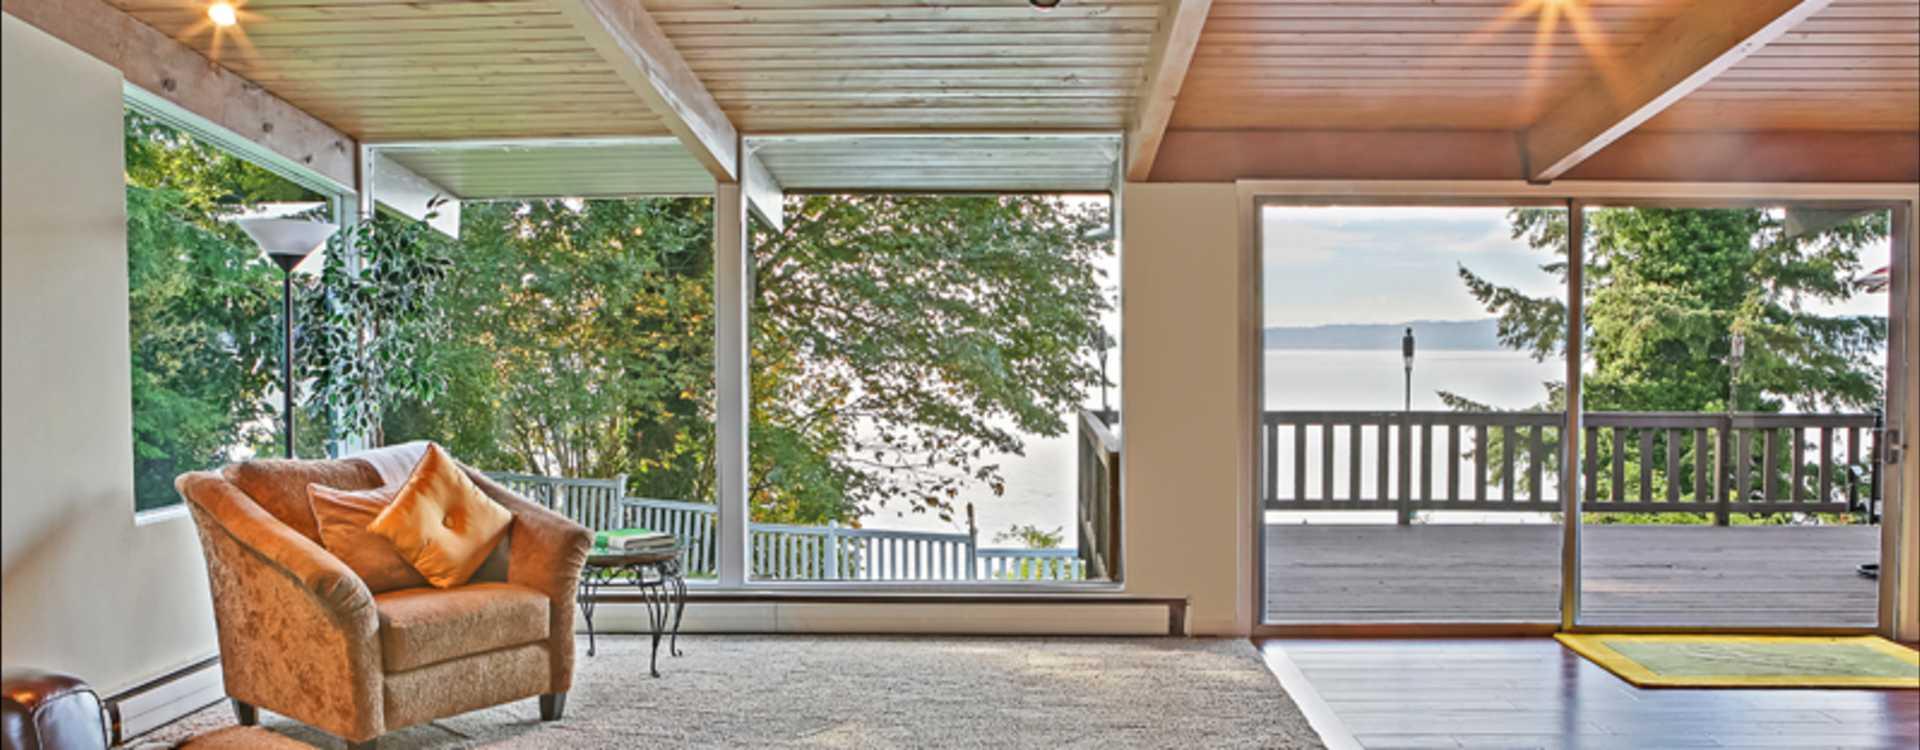 Puget_Sound_Villa_-_Vacation_Rental_Home-3.jpg